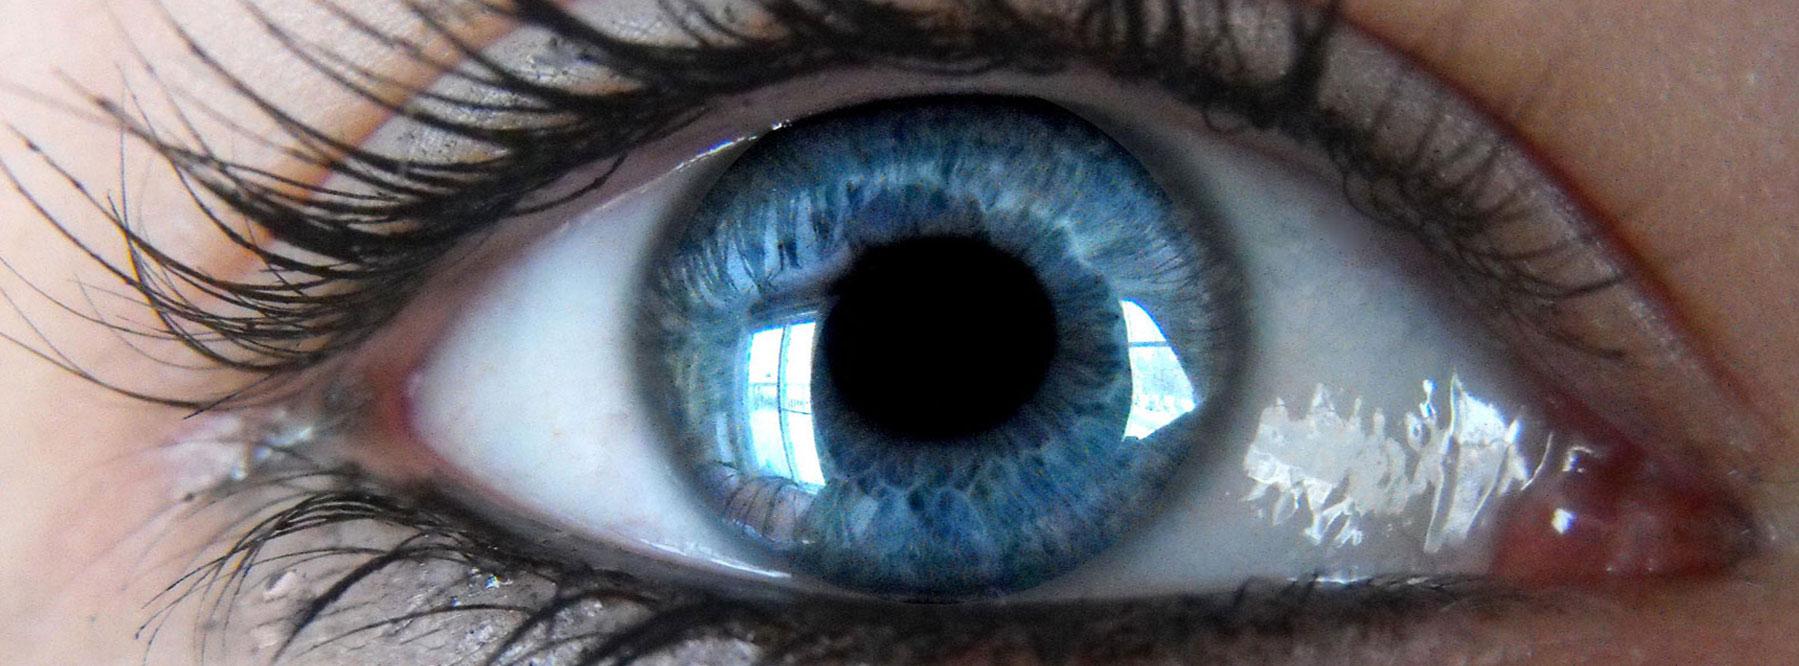 25 Gauge Vitrectomy Eye Surgery | Randall Wong, M.D. | Retina Specialist, Fairfax, Virginia 22031